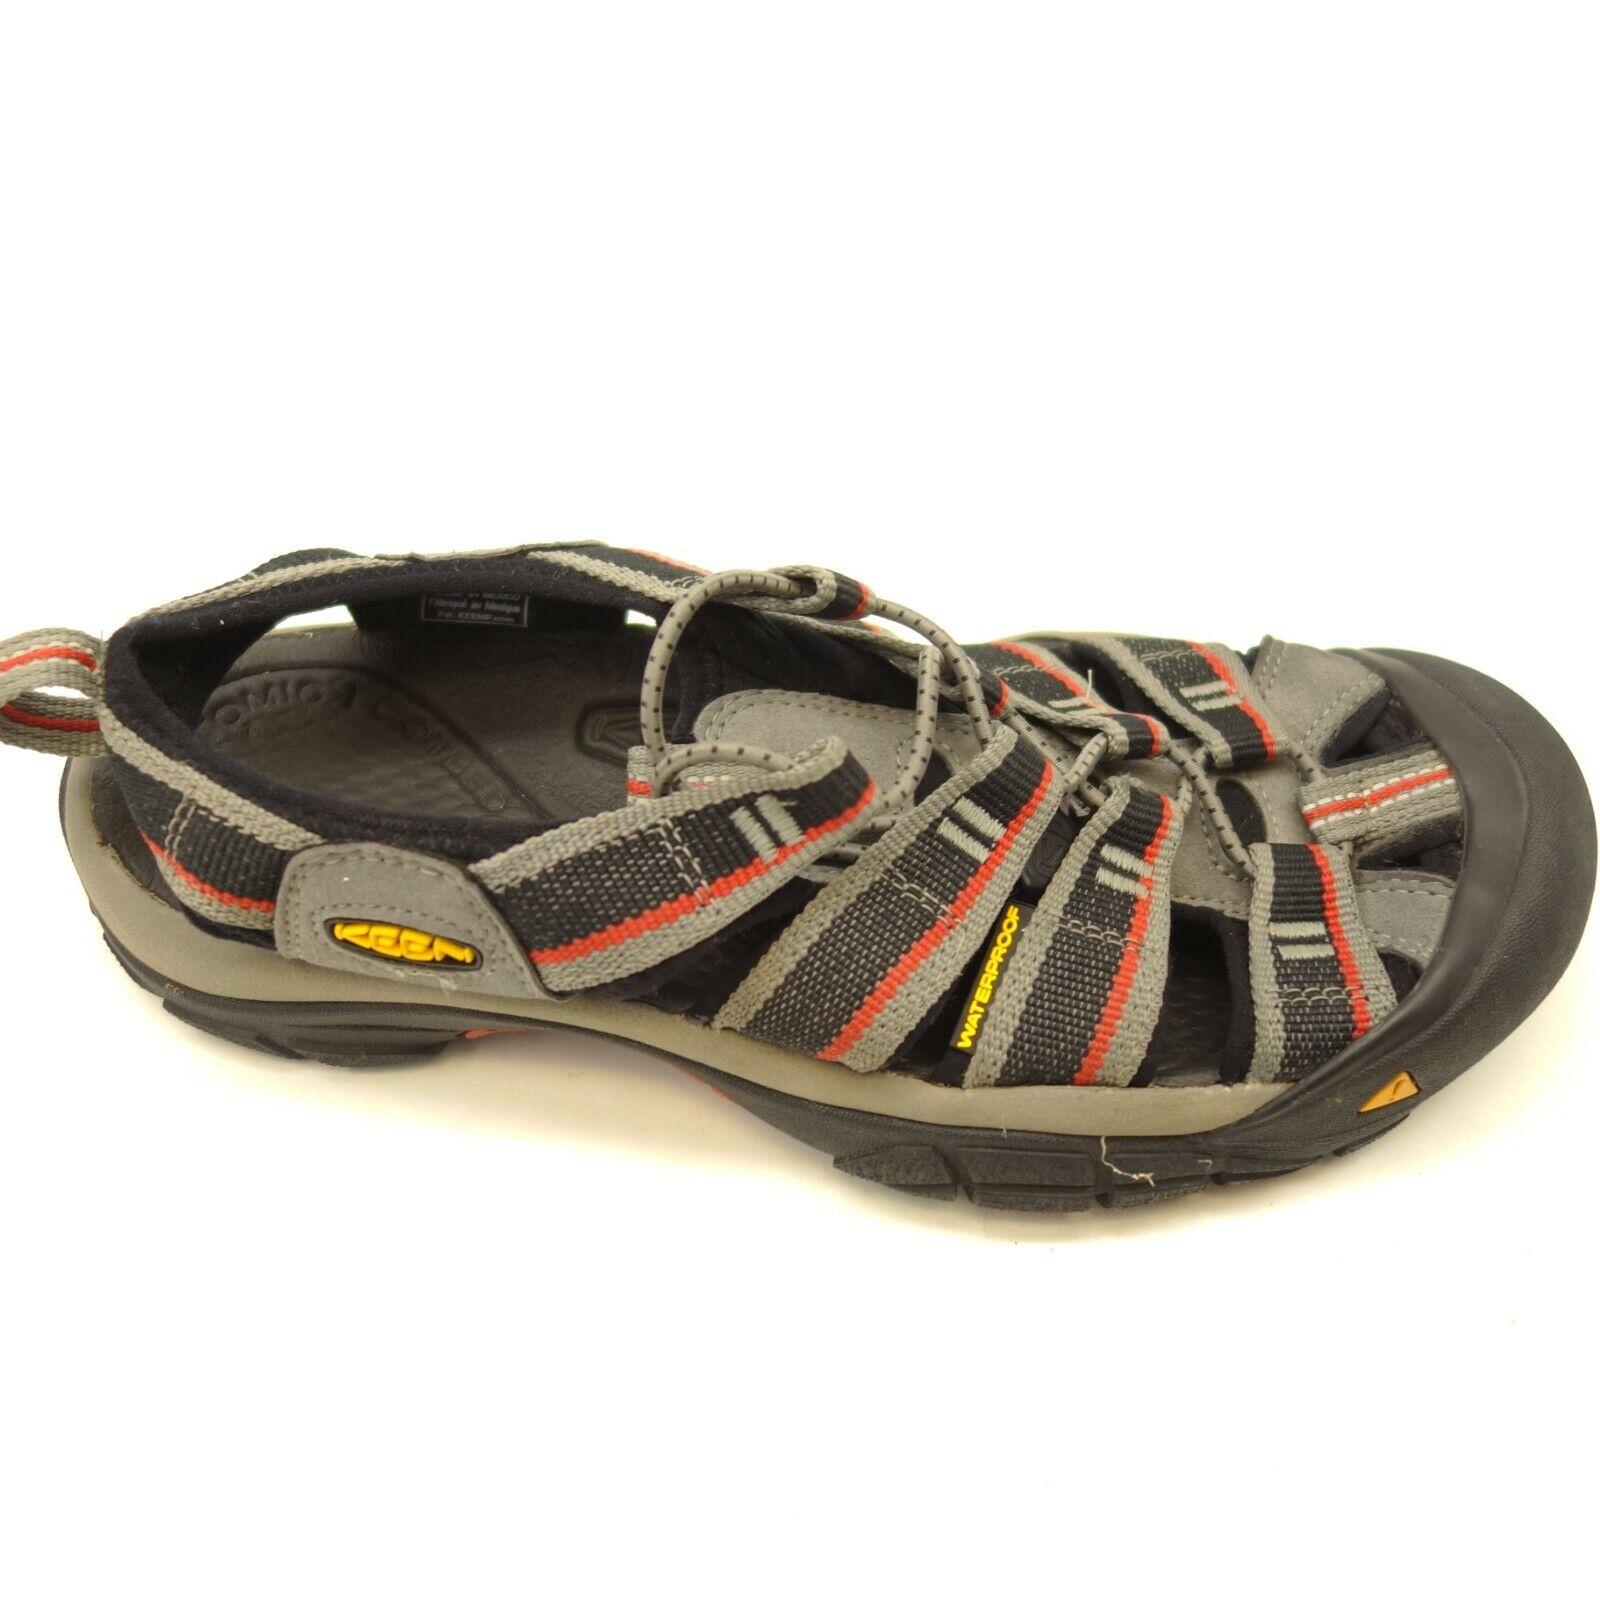 KEEN Newport H2 US 7.5 Bossa Nova para Caminar Sandalias Para Hombre Zapatos De Agua